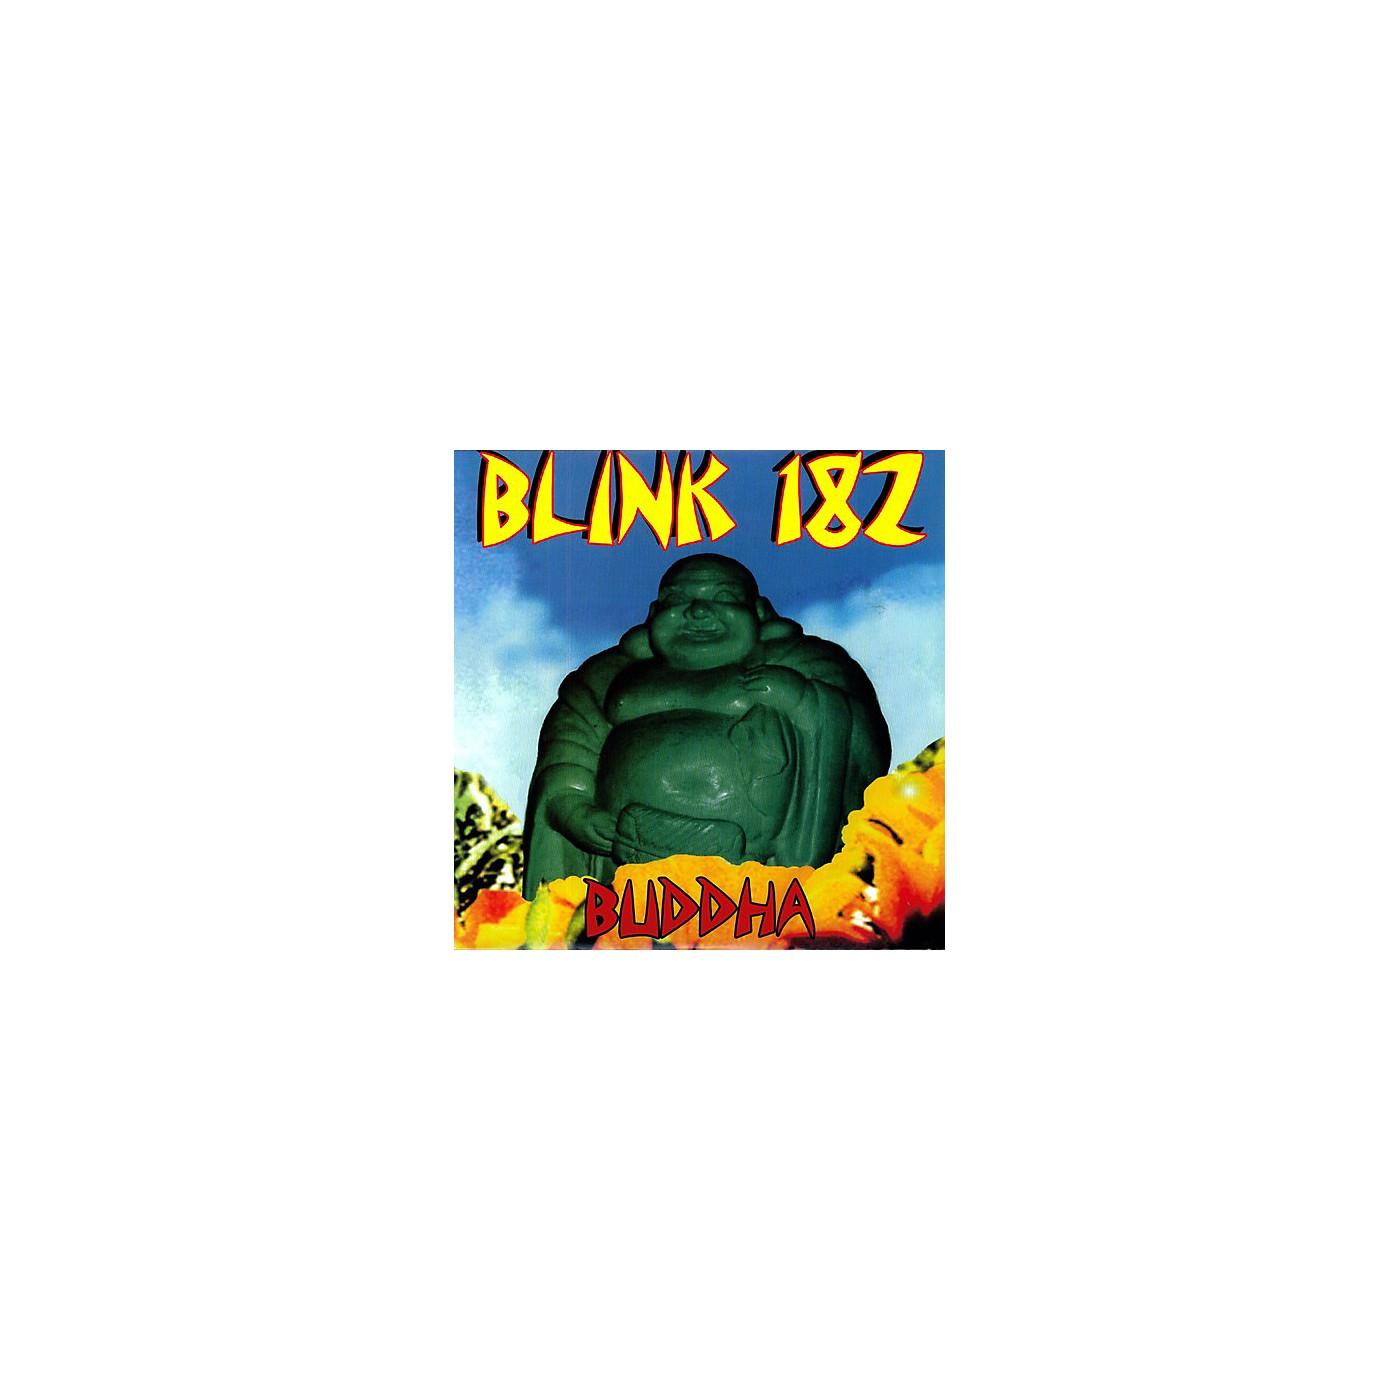 Alliance blink-182 - Buddha thumbnail